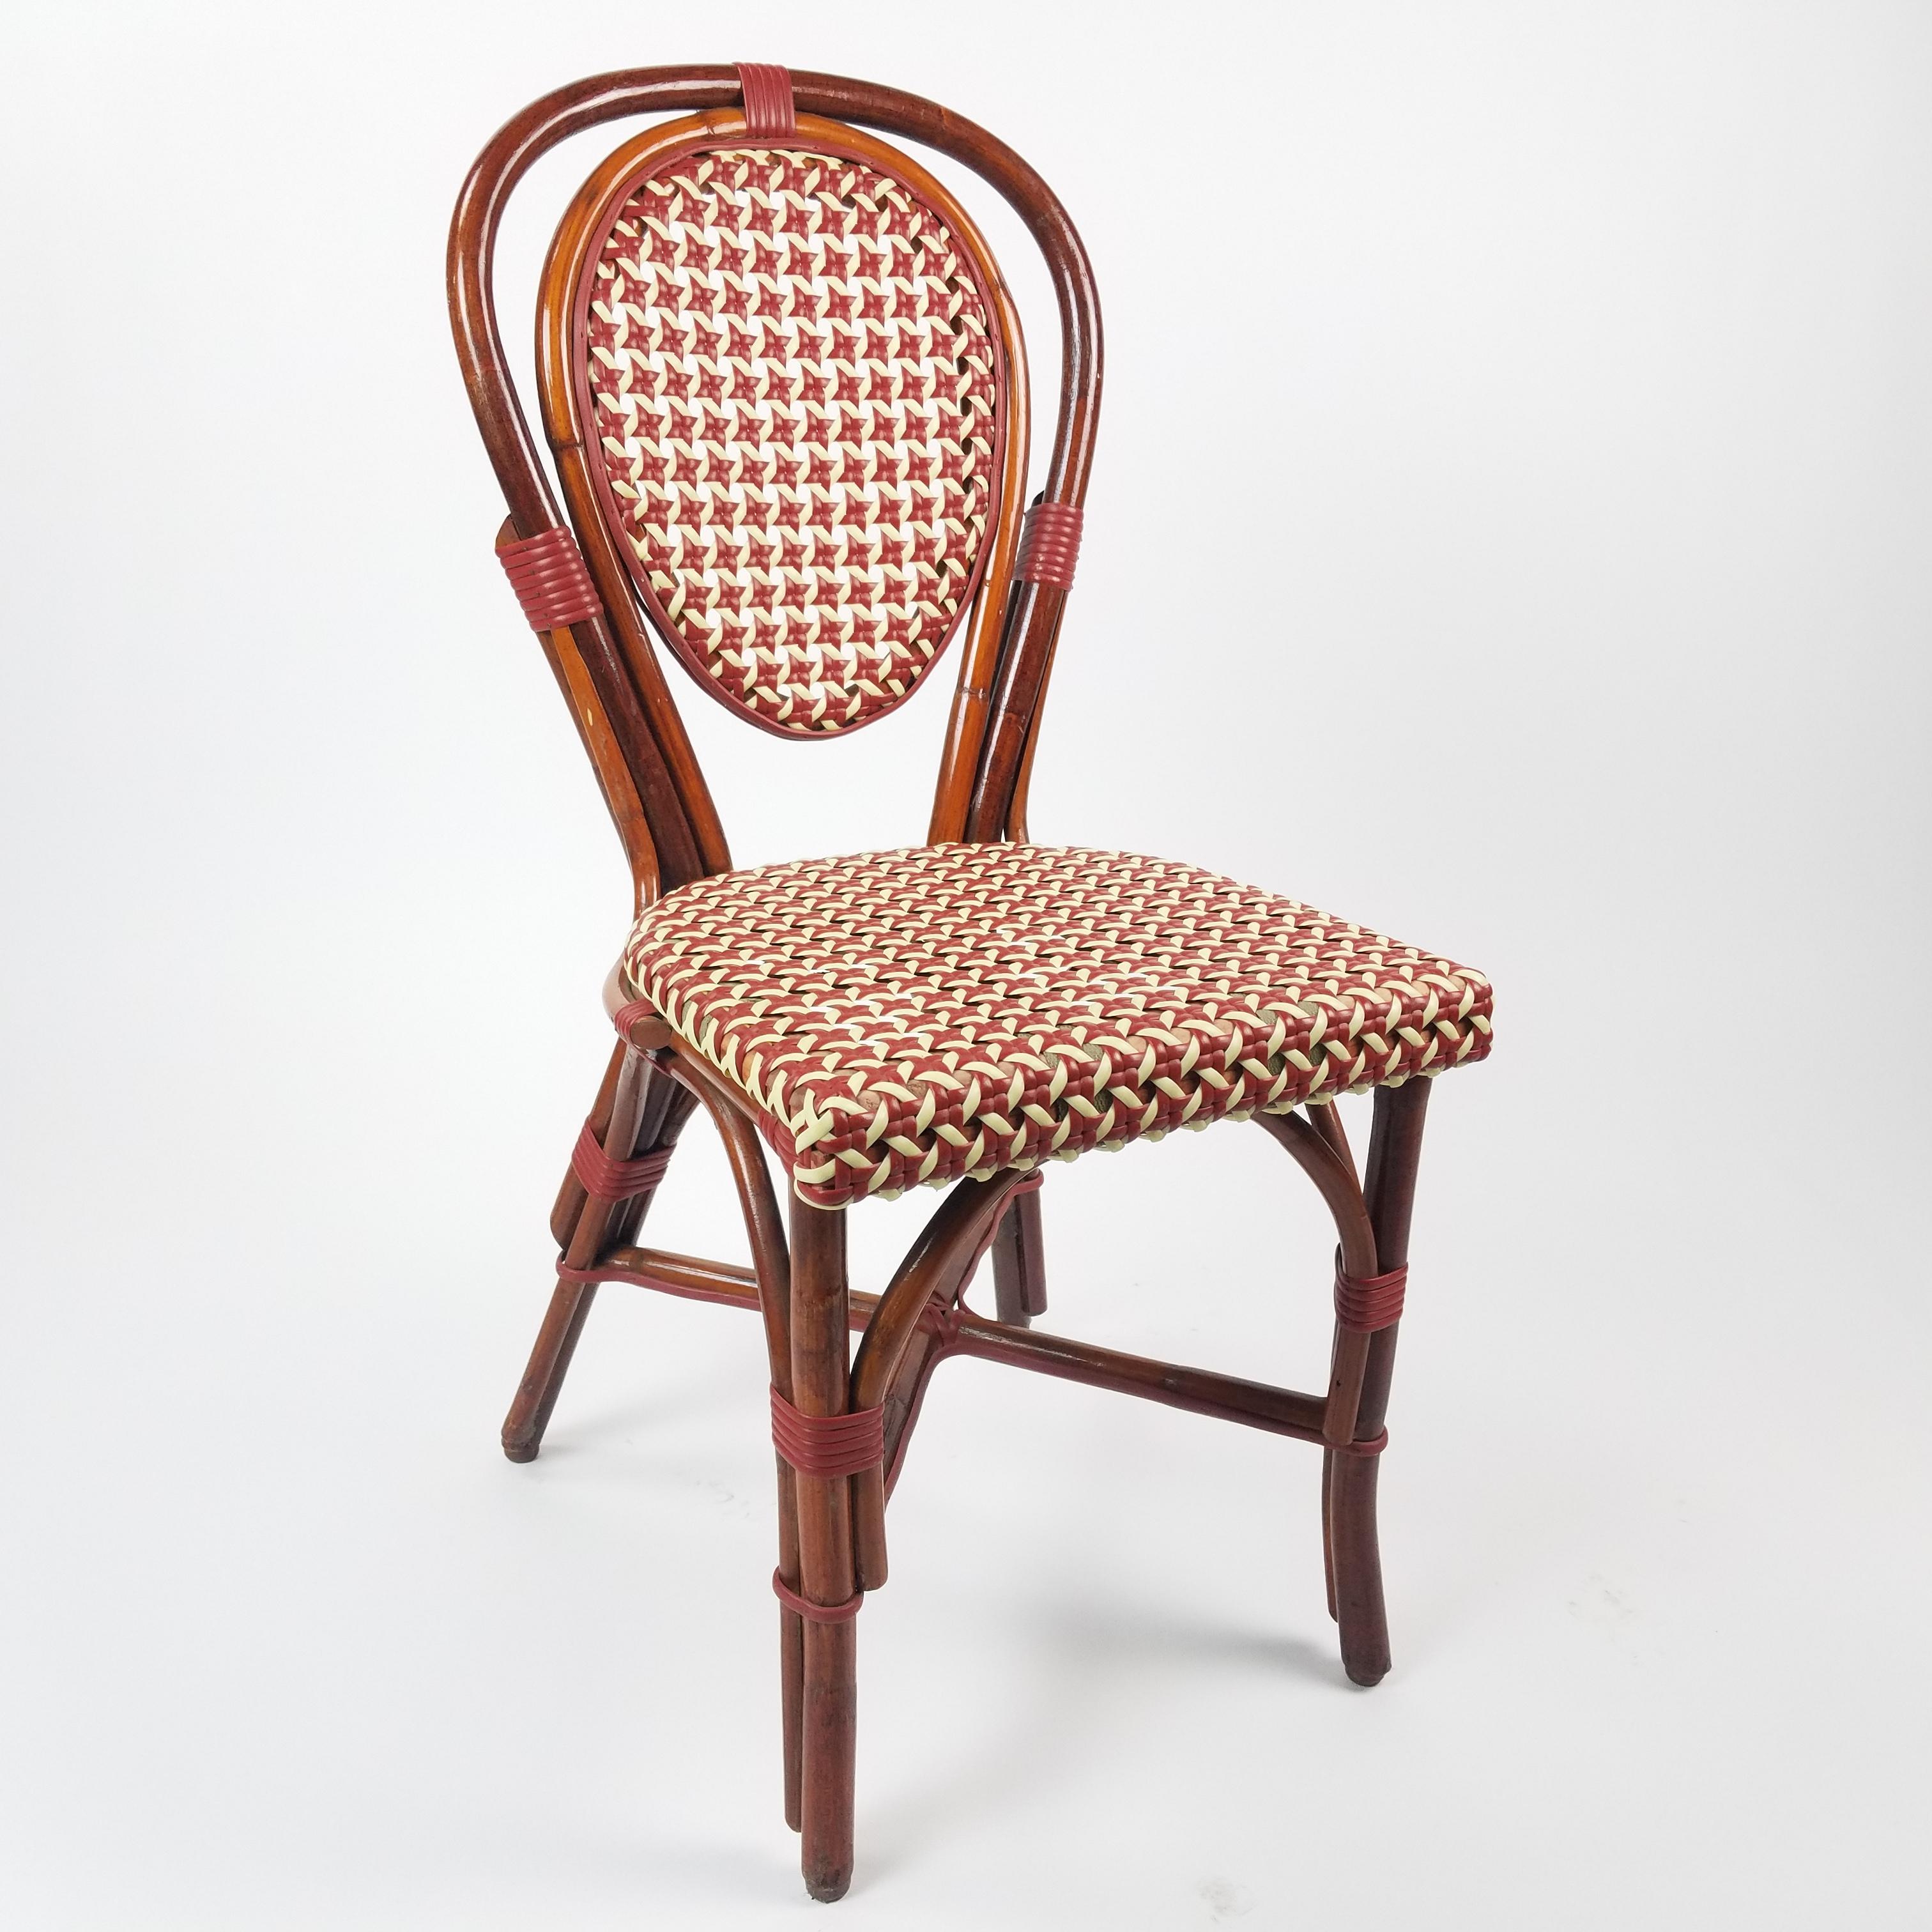 Chair bentwood rattan bistro maroon cream air designs - Cane bistro chairs ...